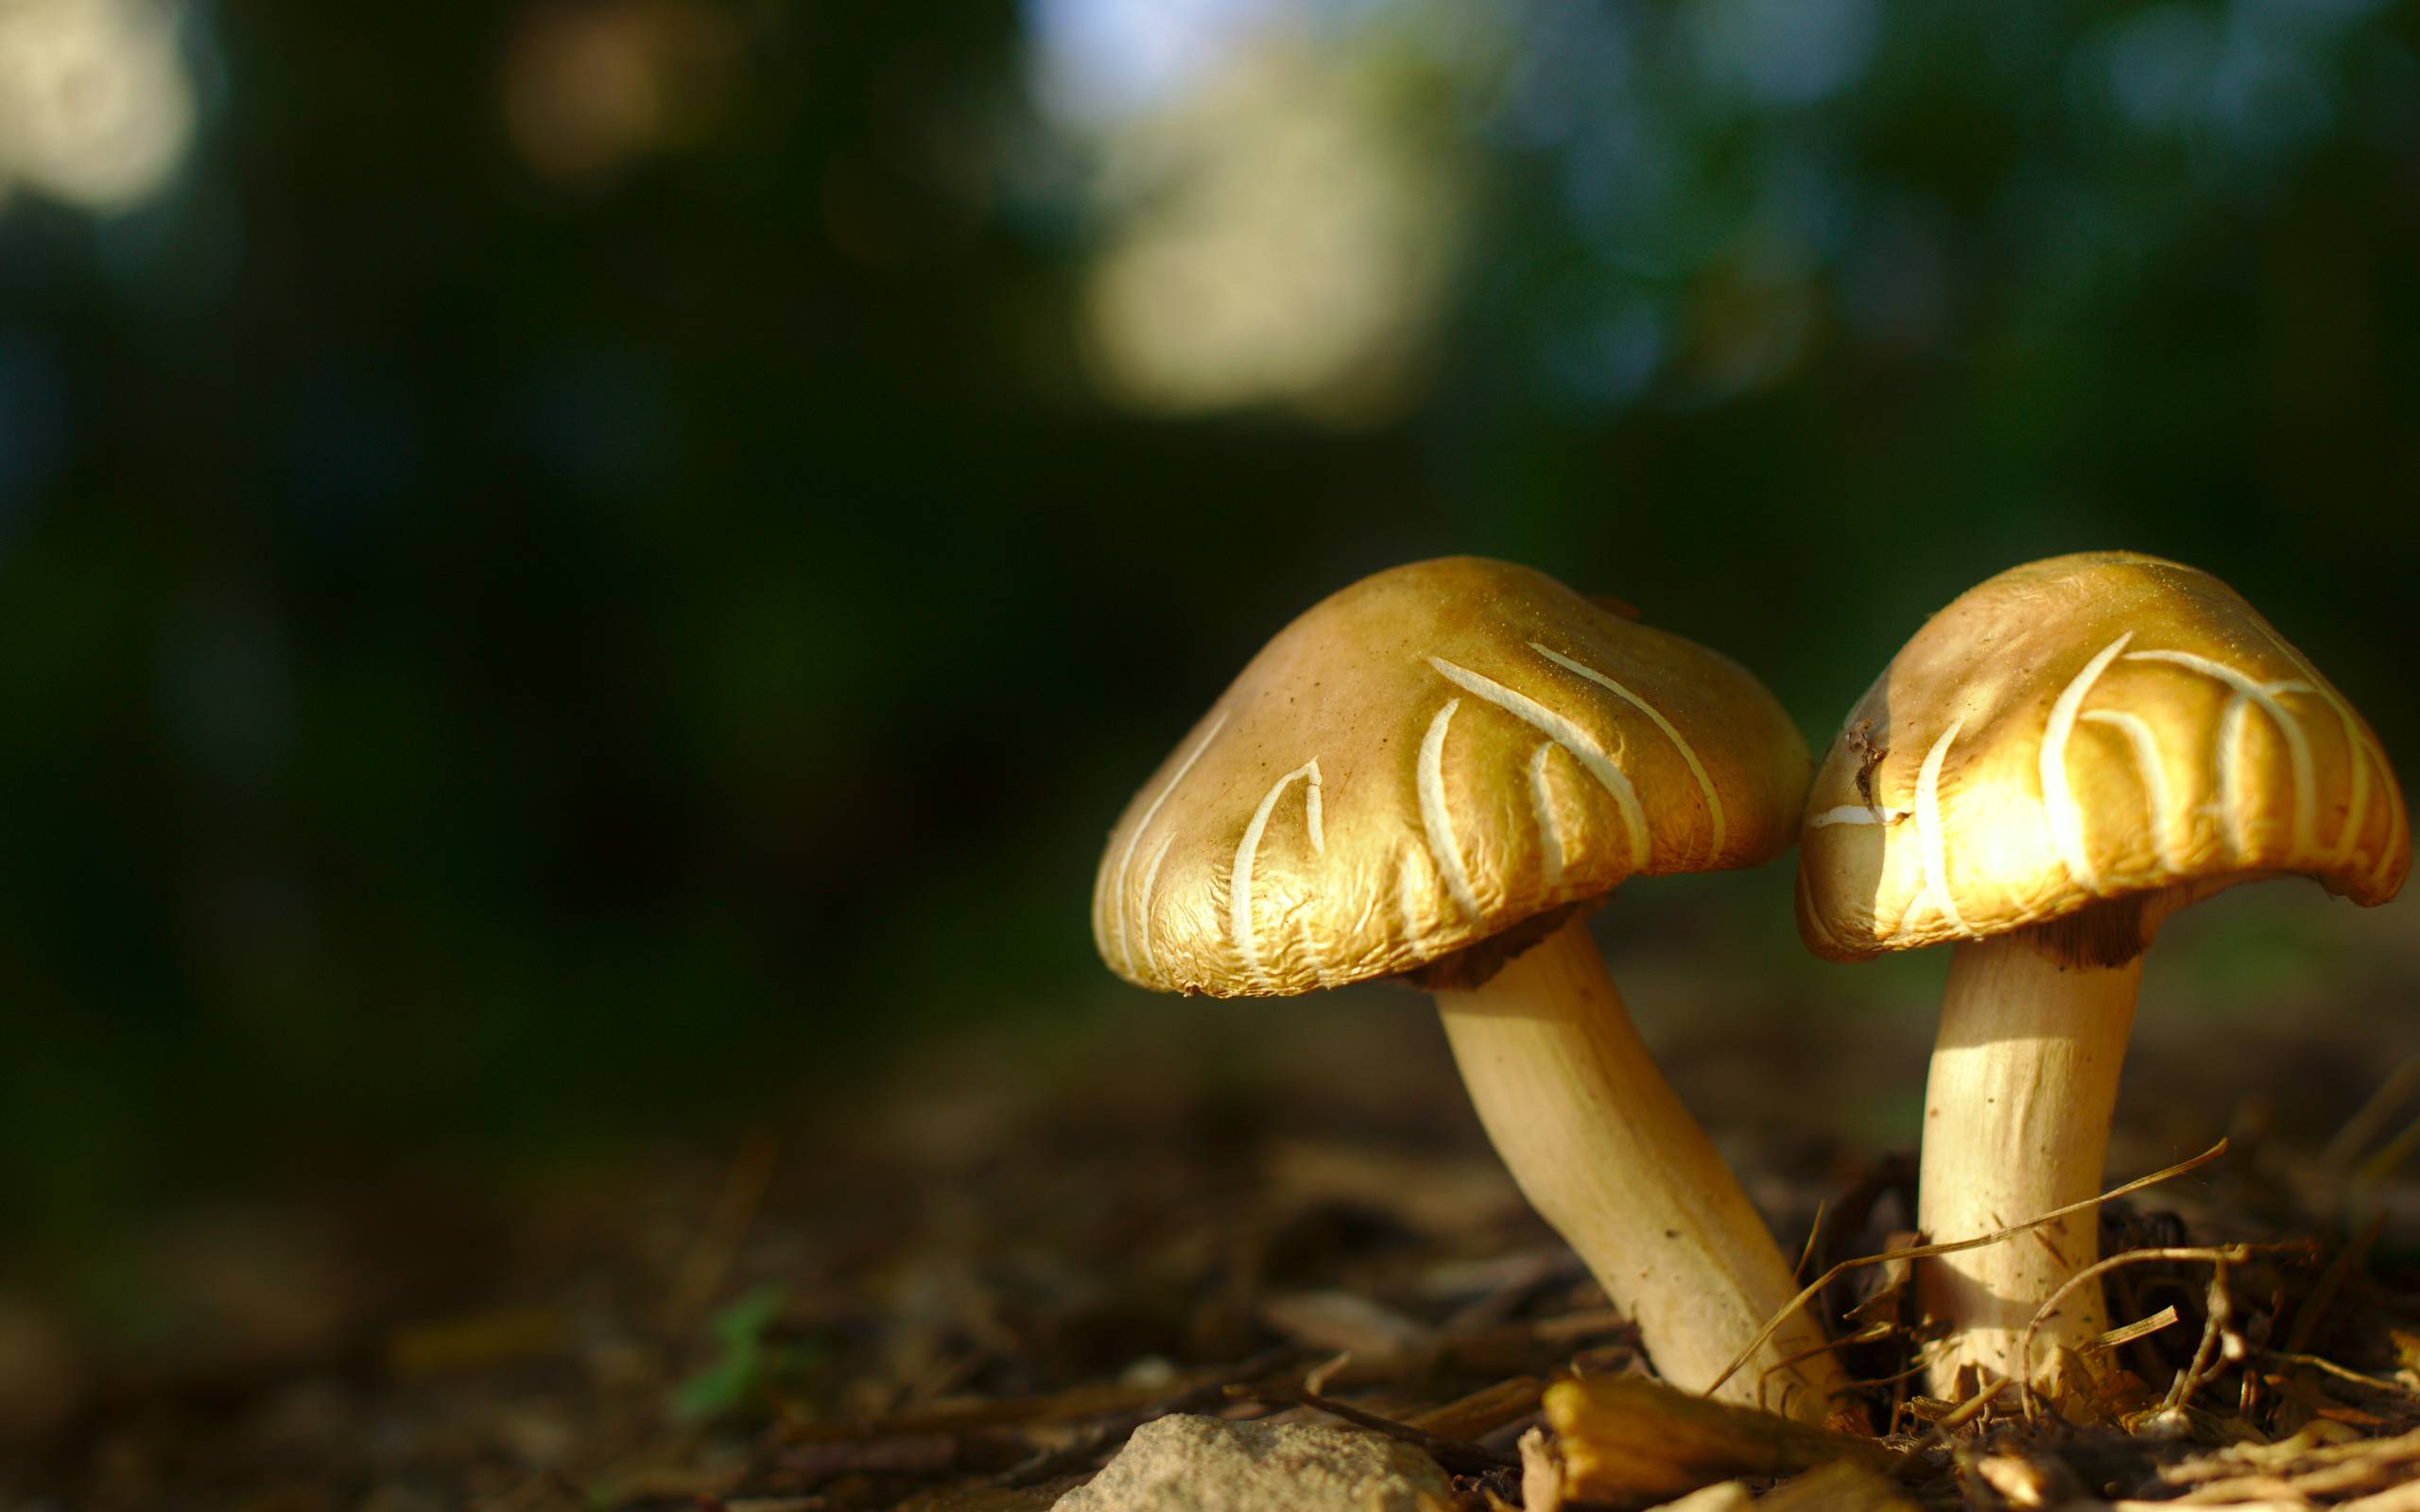 mushroom family wallpaper desktop - photo #17